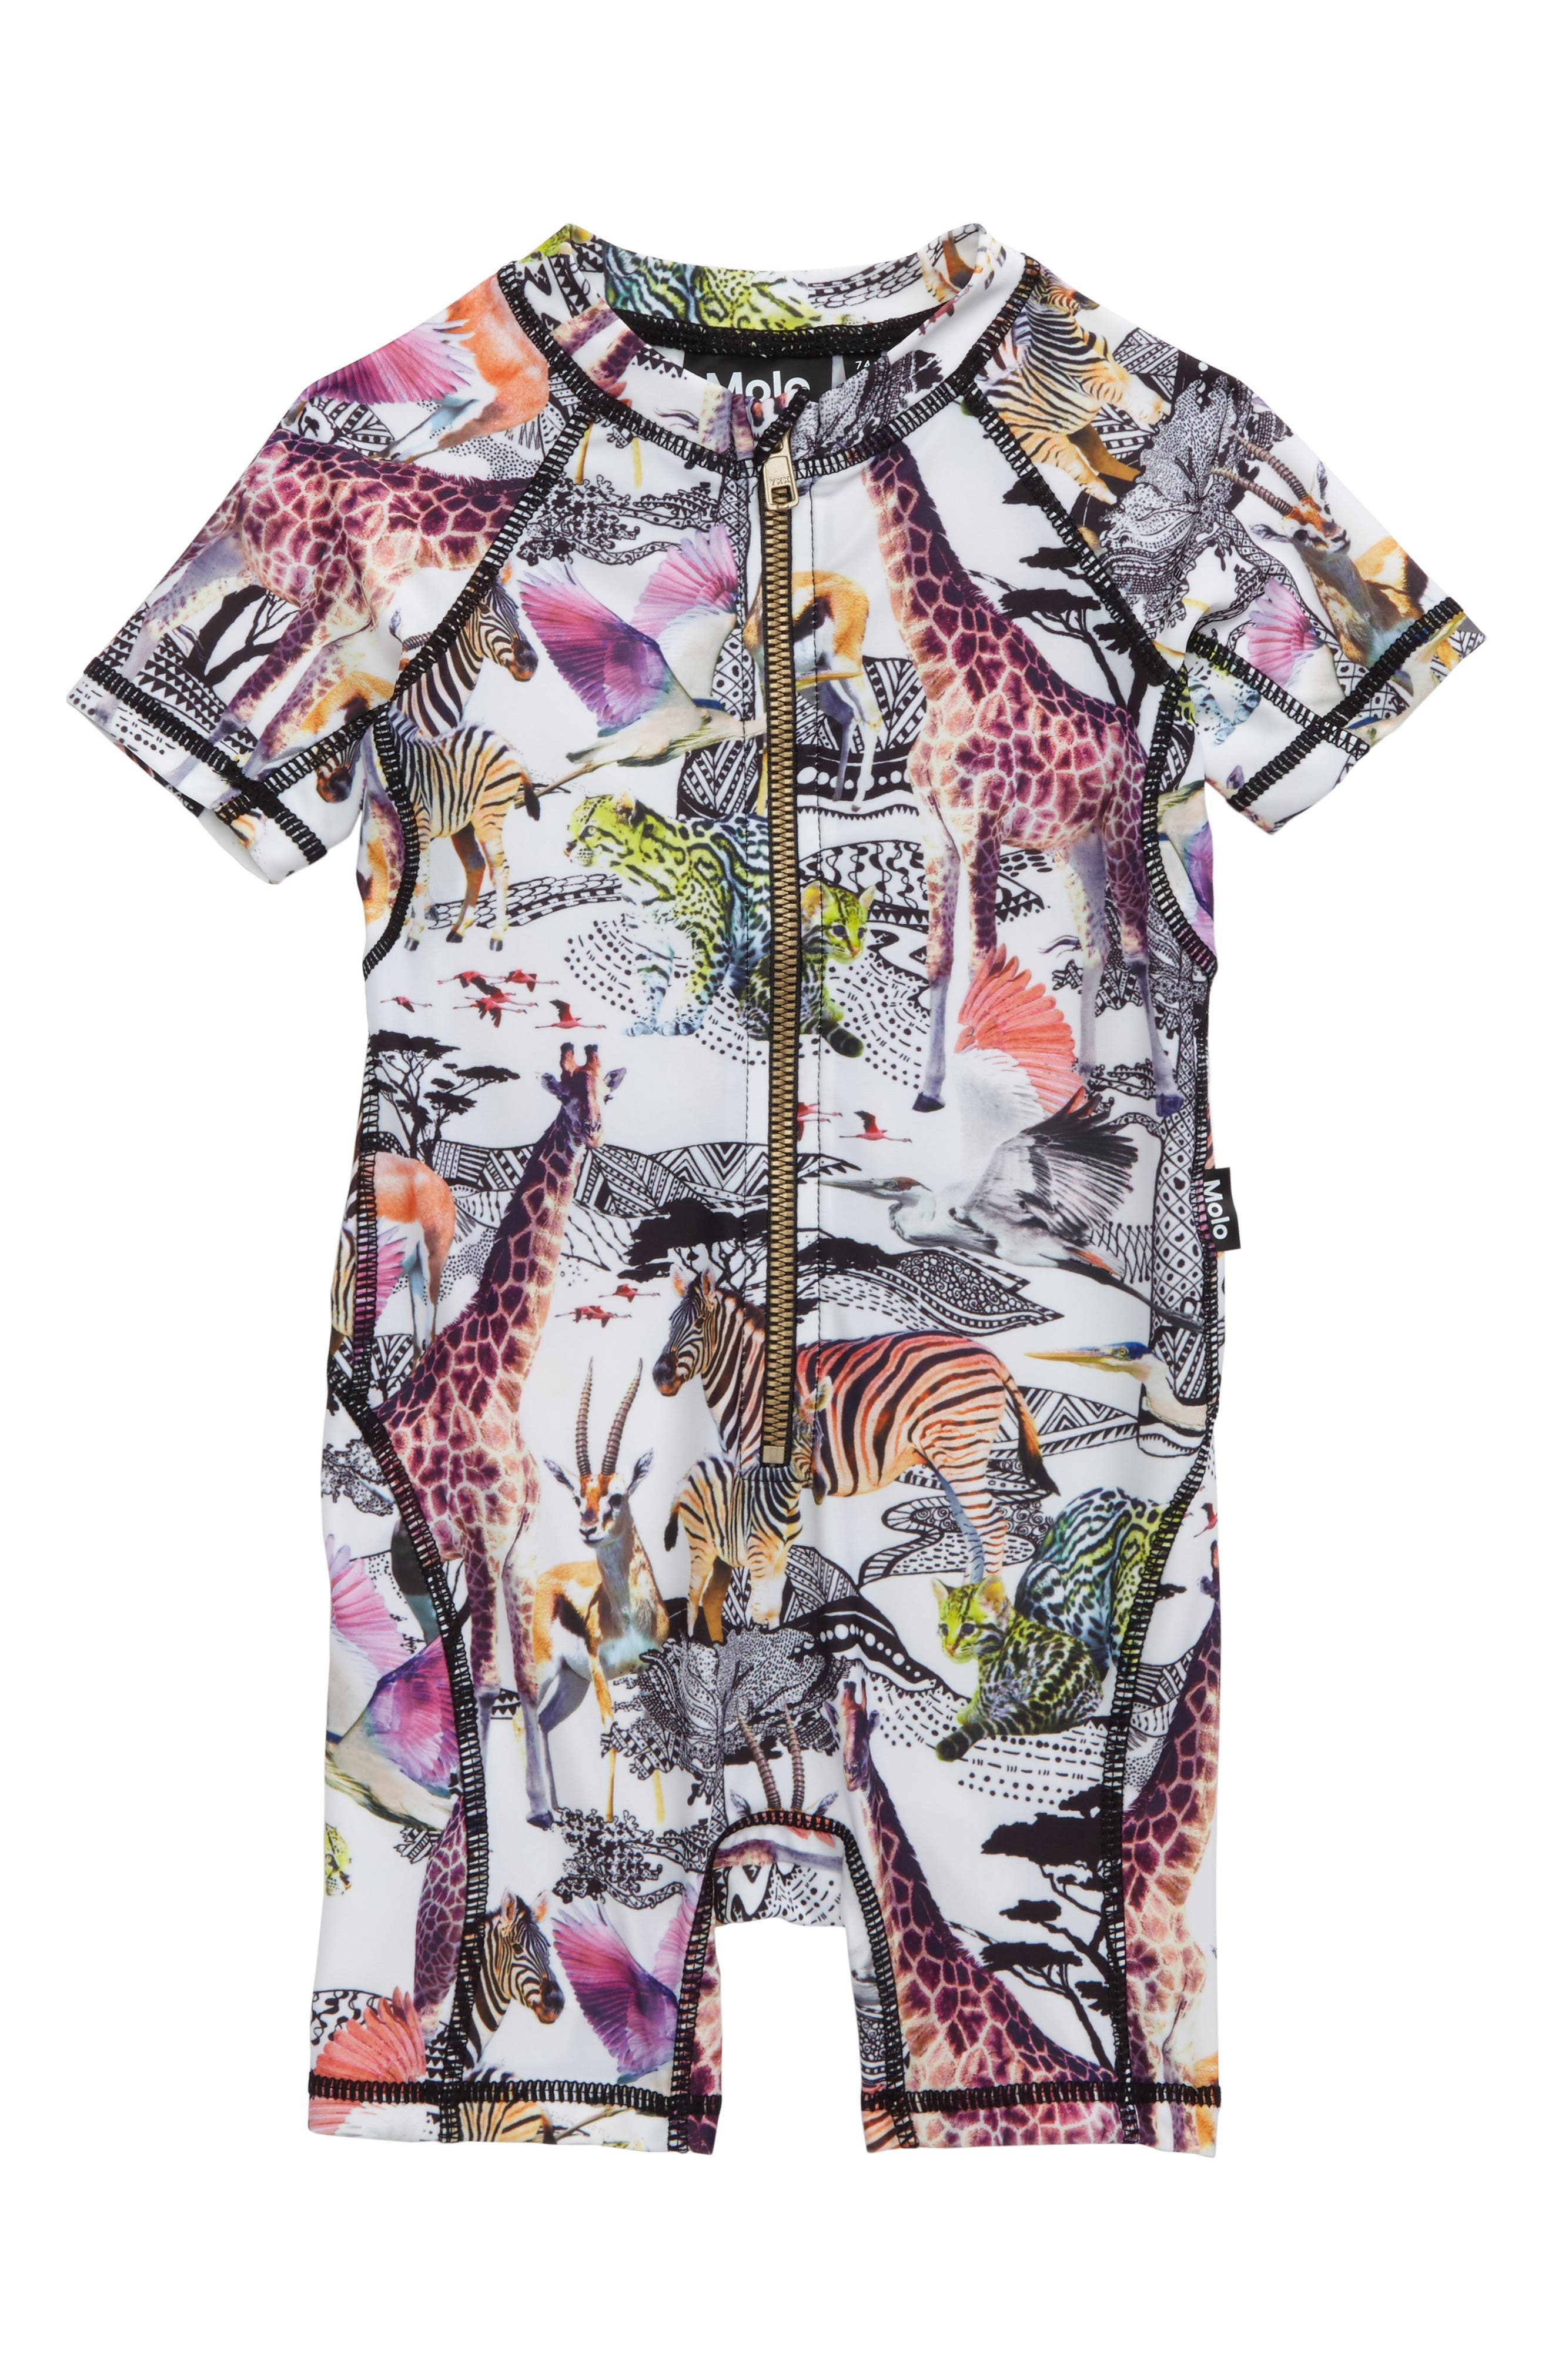 Alternate Image 1 Selected - Molo Neka One-Piece Rashguard Swimsuit (Baby Girls)